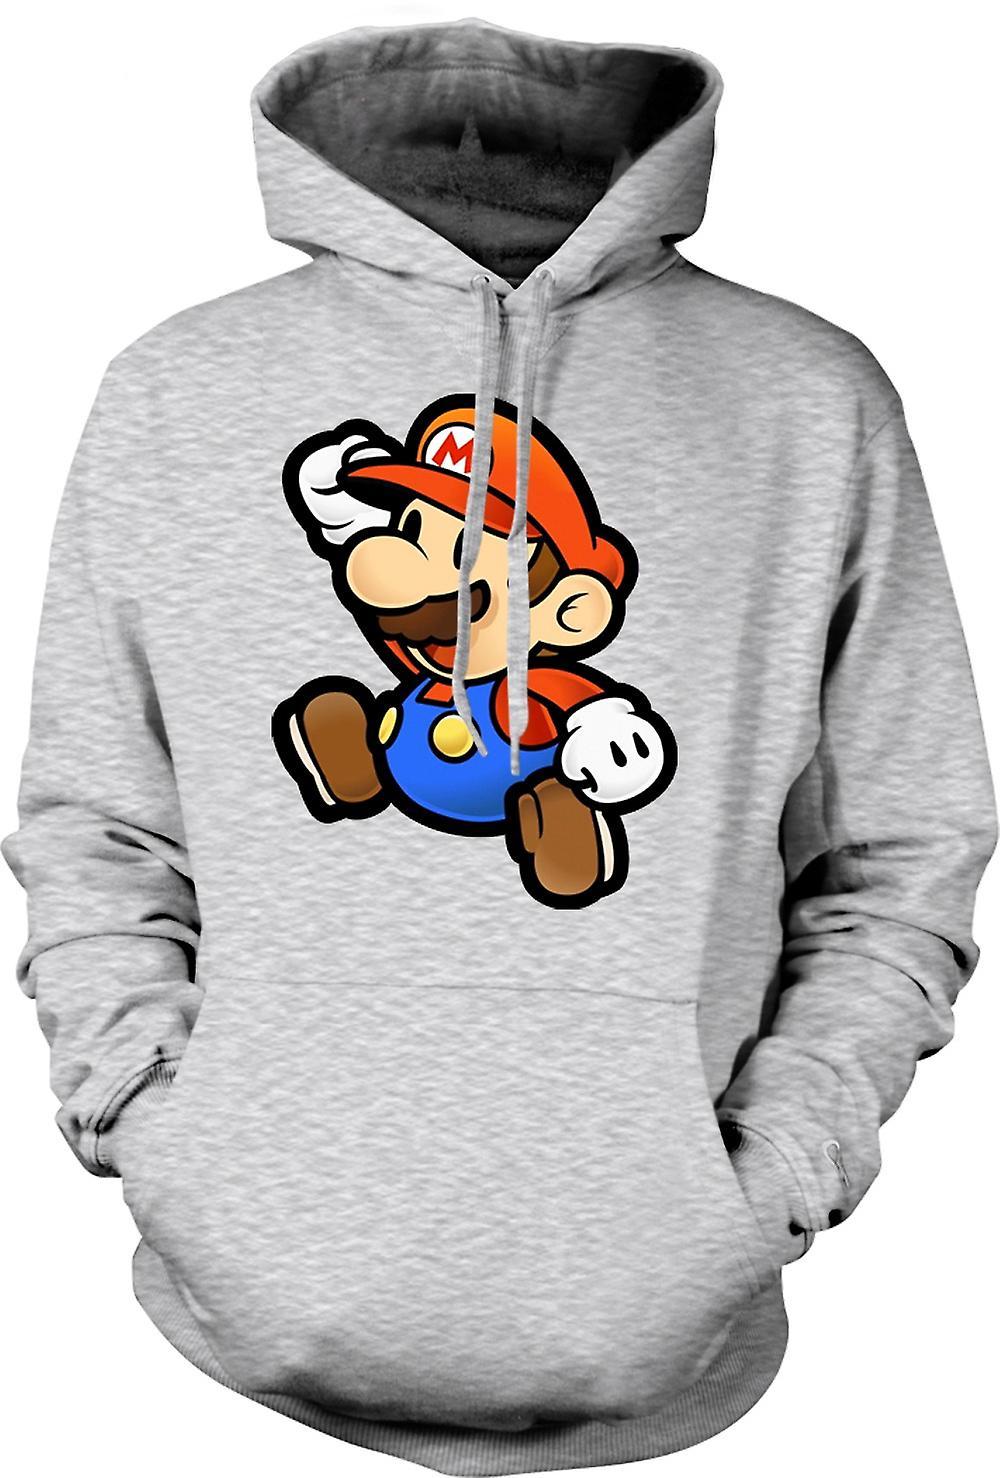 Para hombre con capucha - Super Mario - Gamer